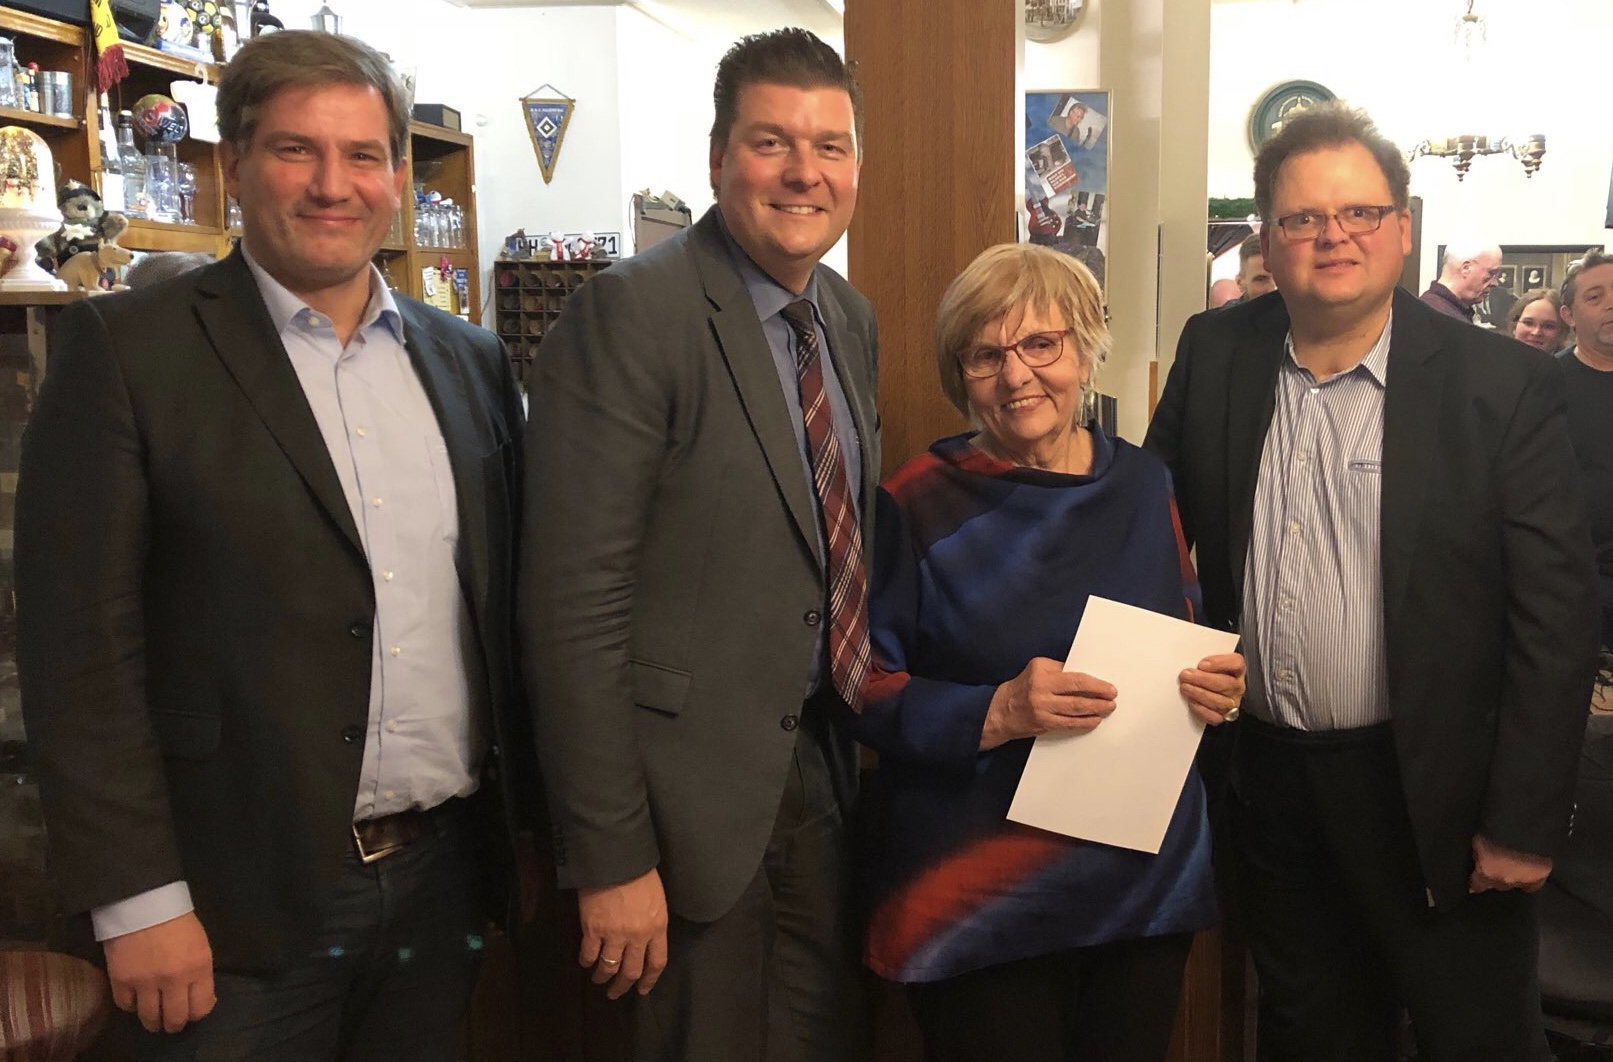 SPD -Metin Hakverdi Dr. Andreas Dressel Elke Schlobohm und  Matthias Czech (v.l.)